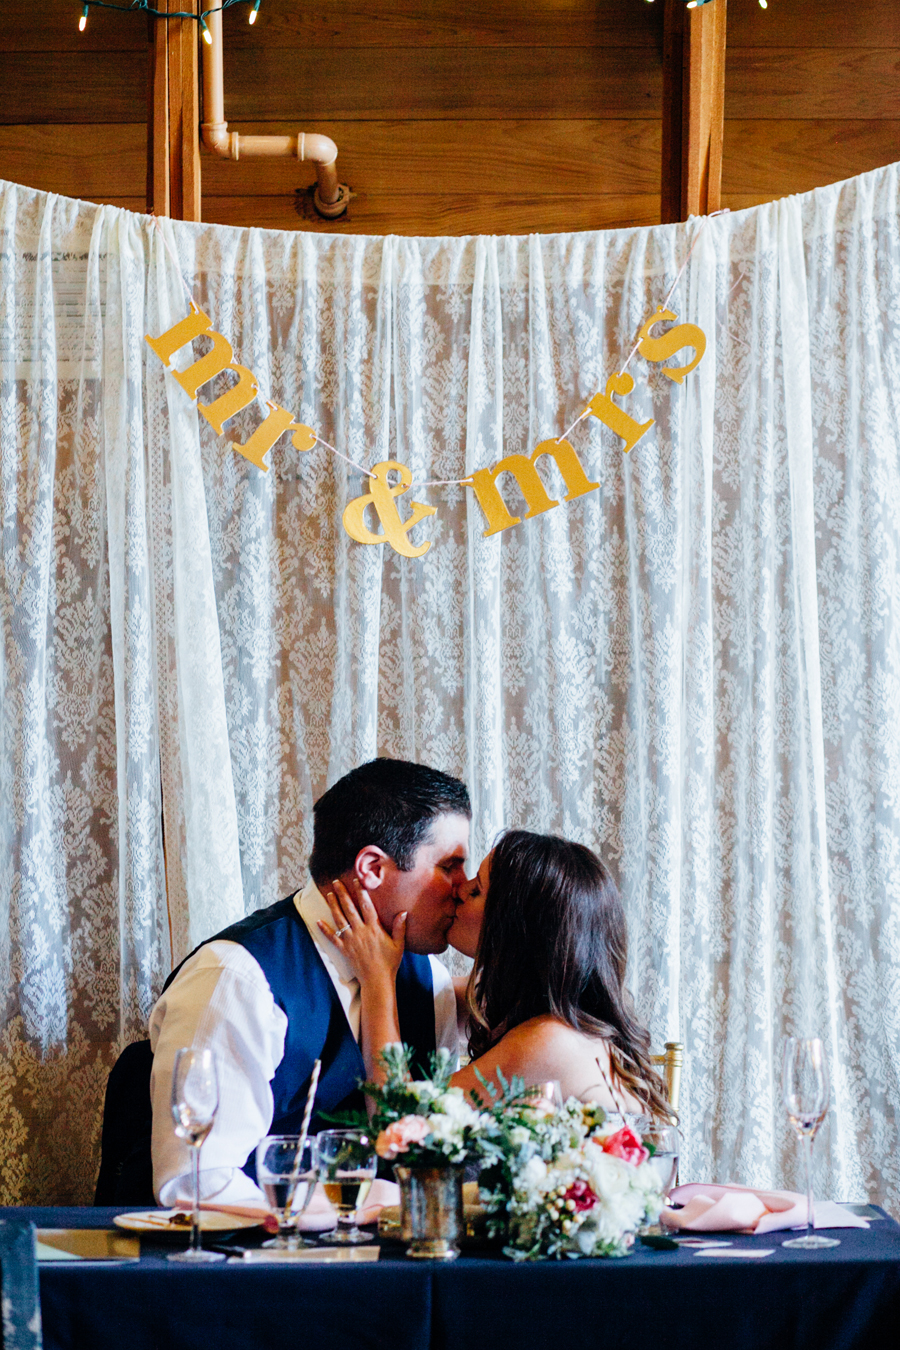 084-seattle-bothell-wedding-photographer-russells-restaurant-wilkins-photo.jpg